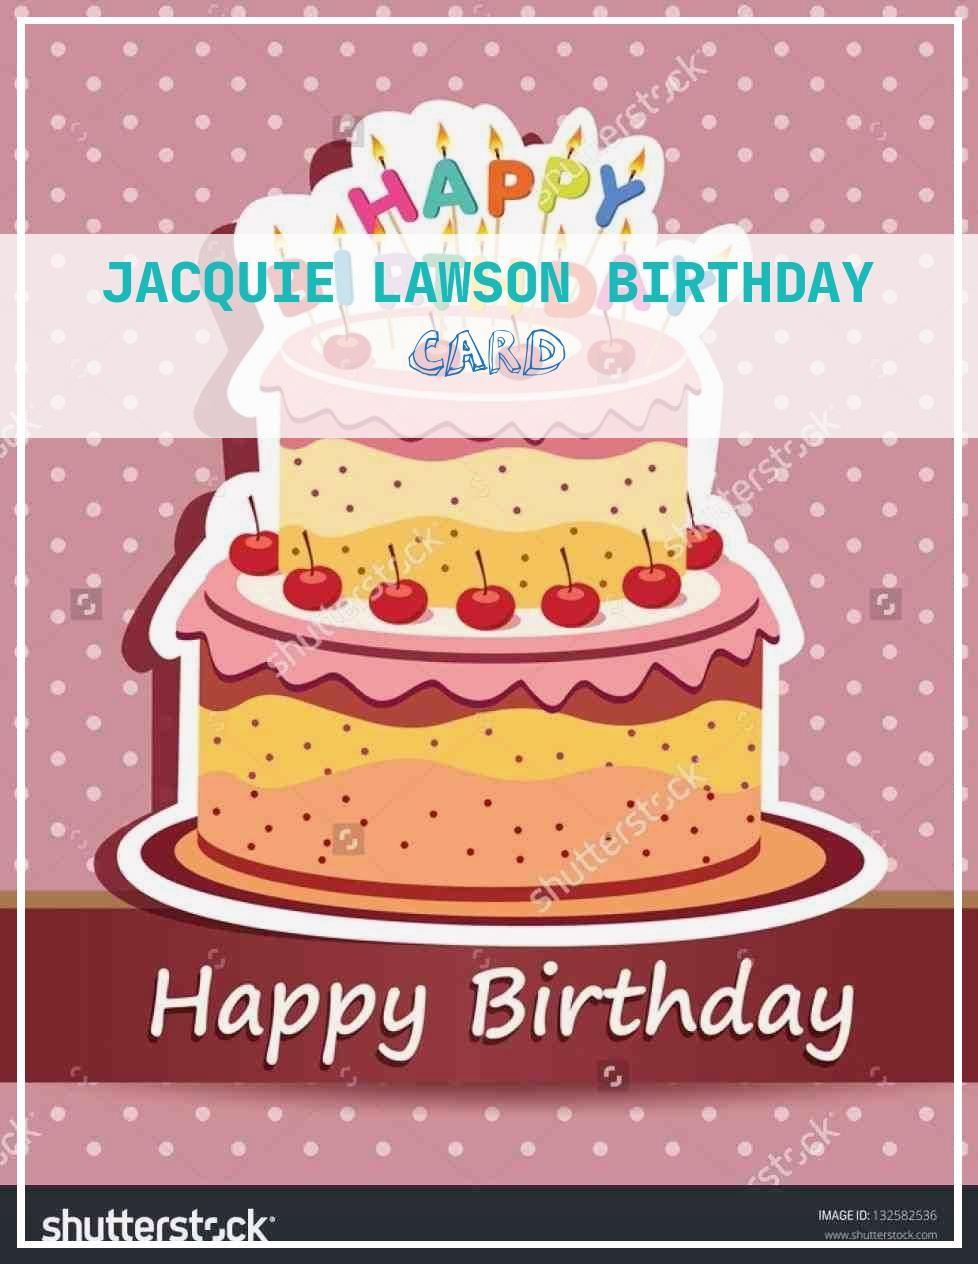 17 Primairet Jacquie Lawson Birthday Card Cool Birthday Cards Birthday Cards Homemade Birthday Cards